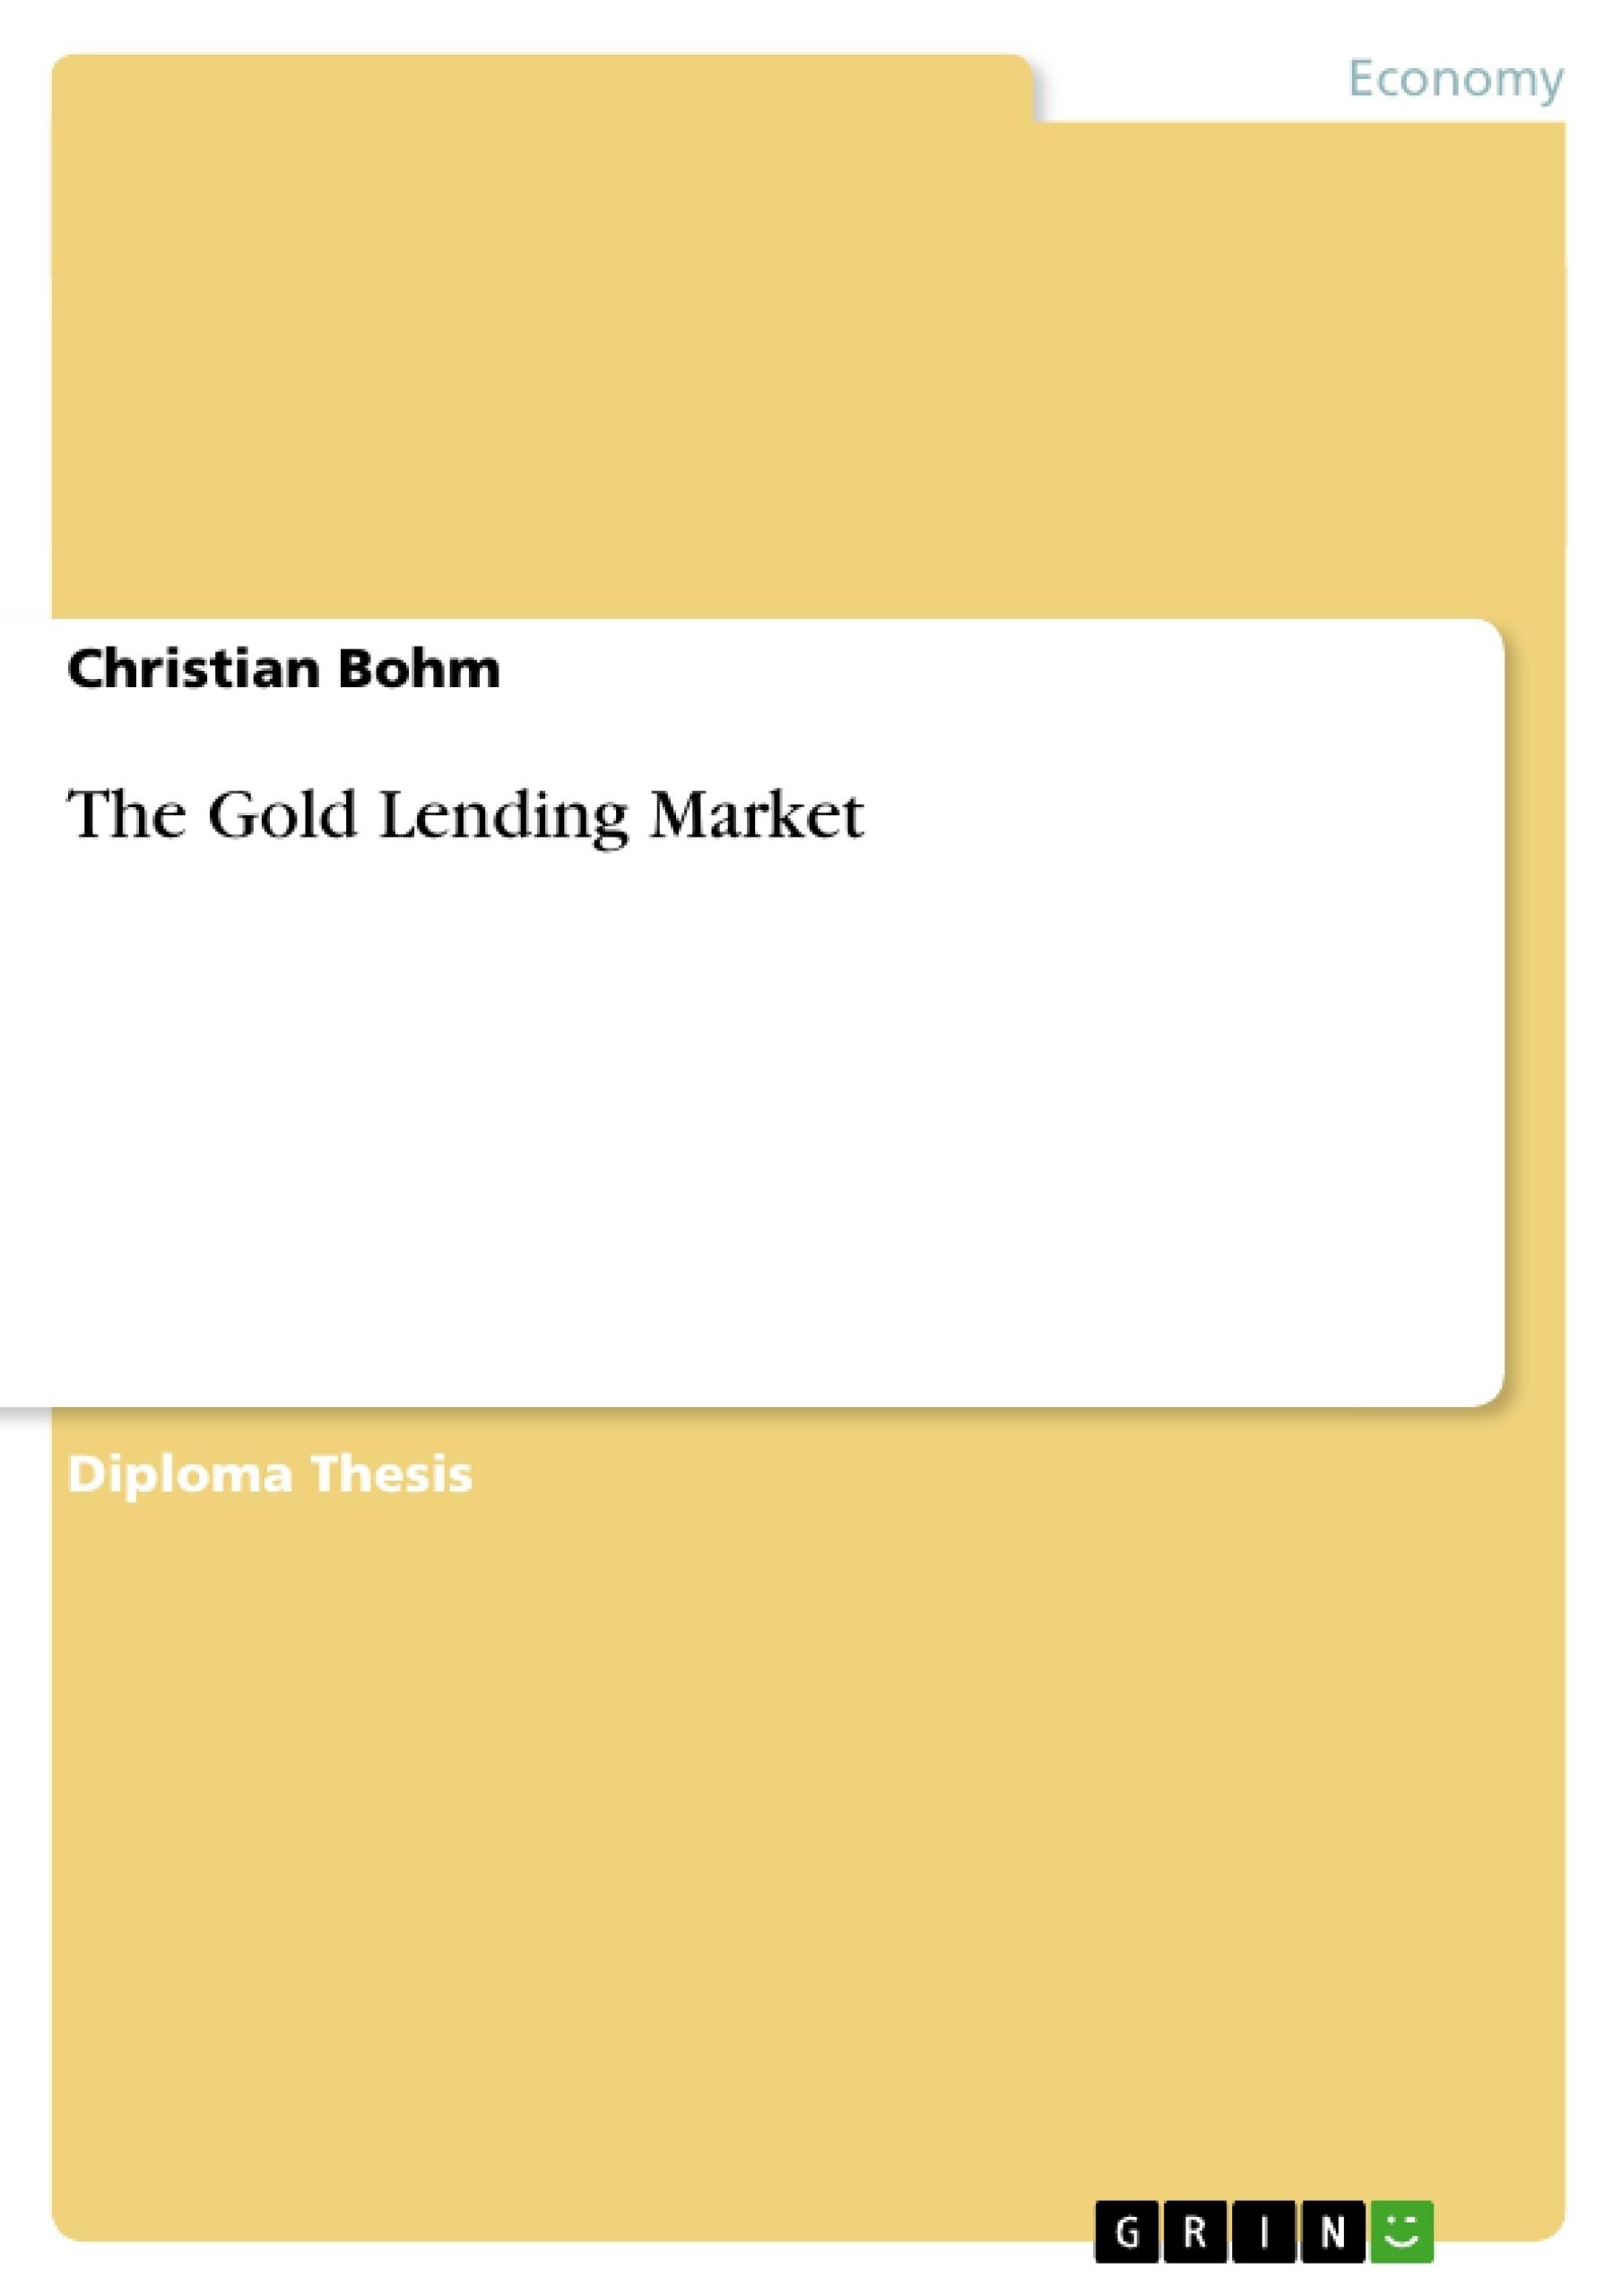 Title: The Gold Lending Market